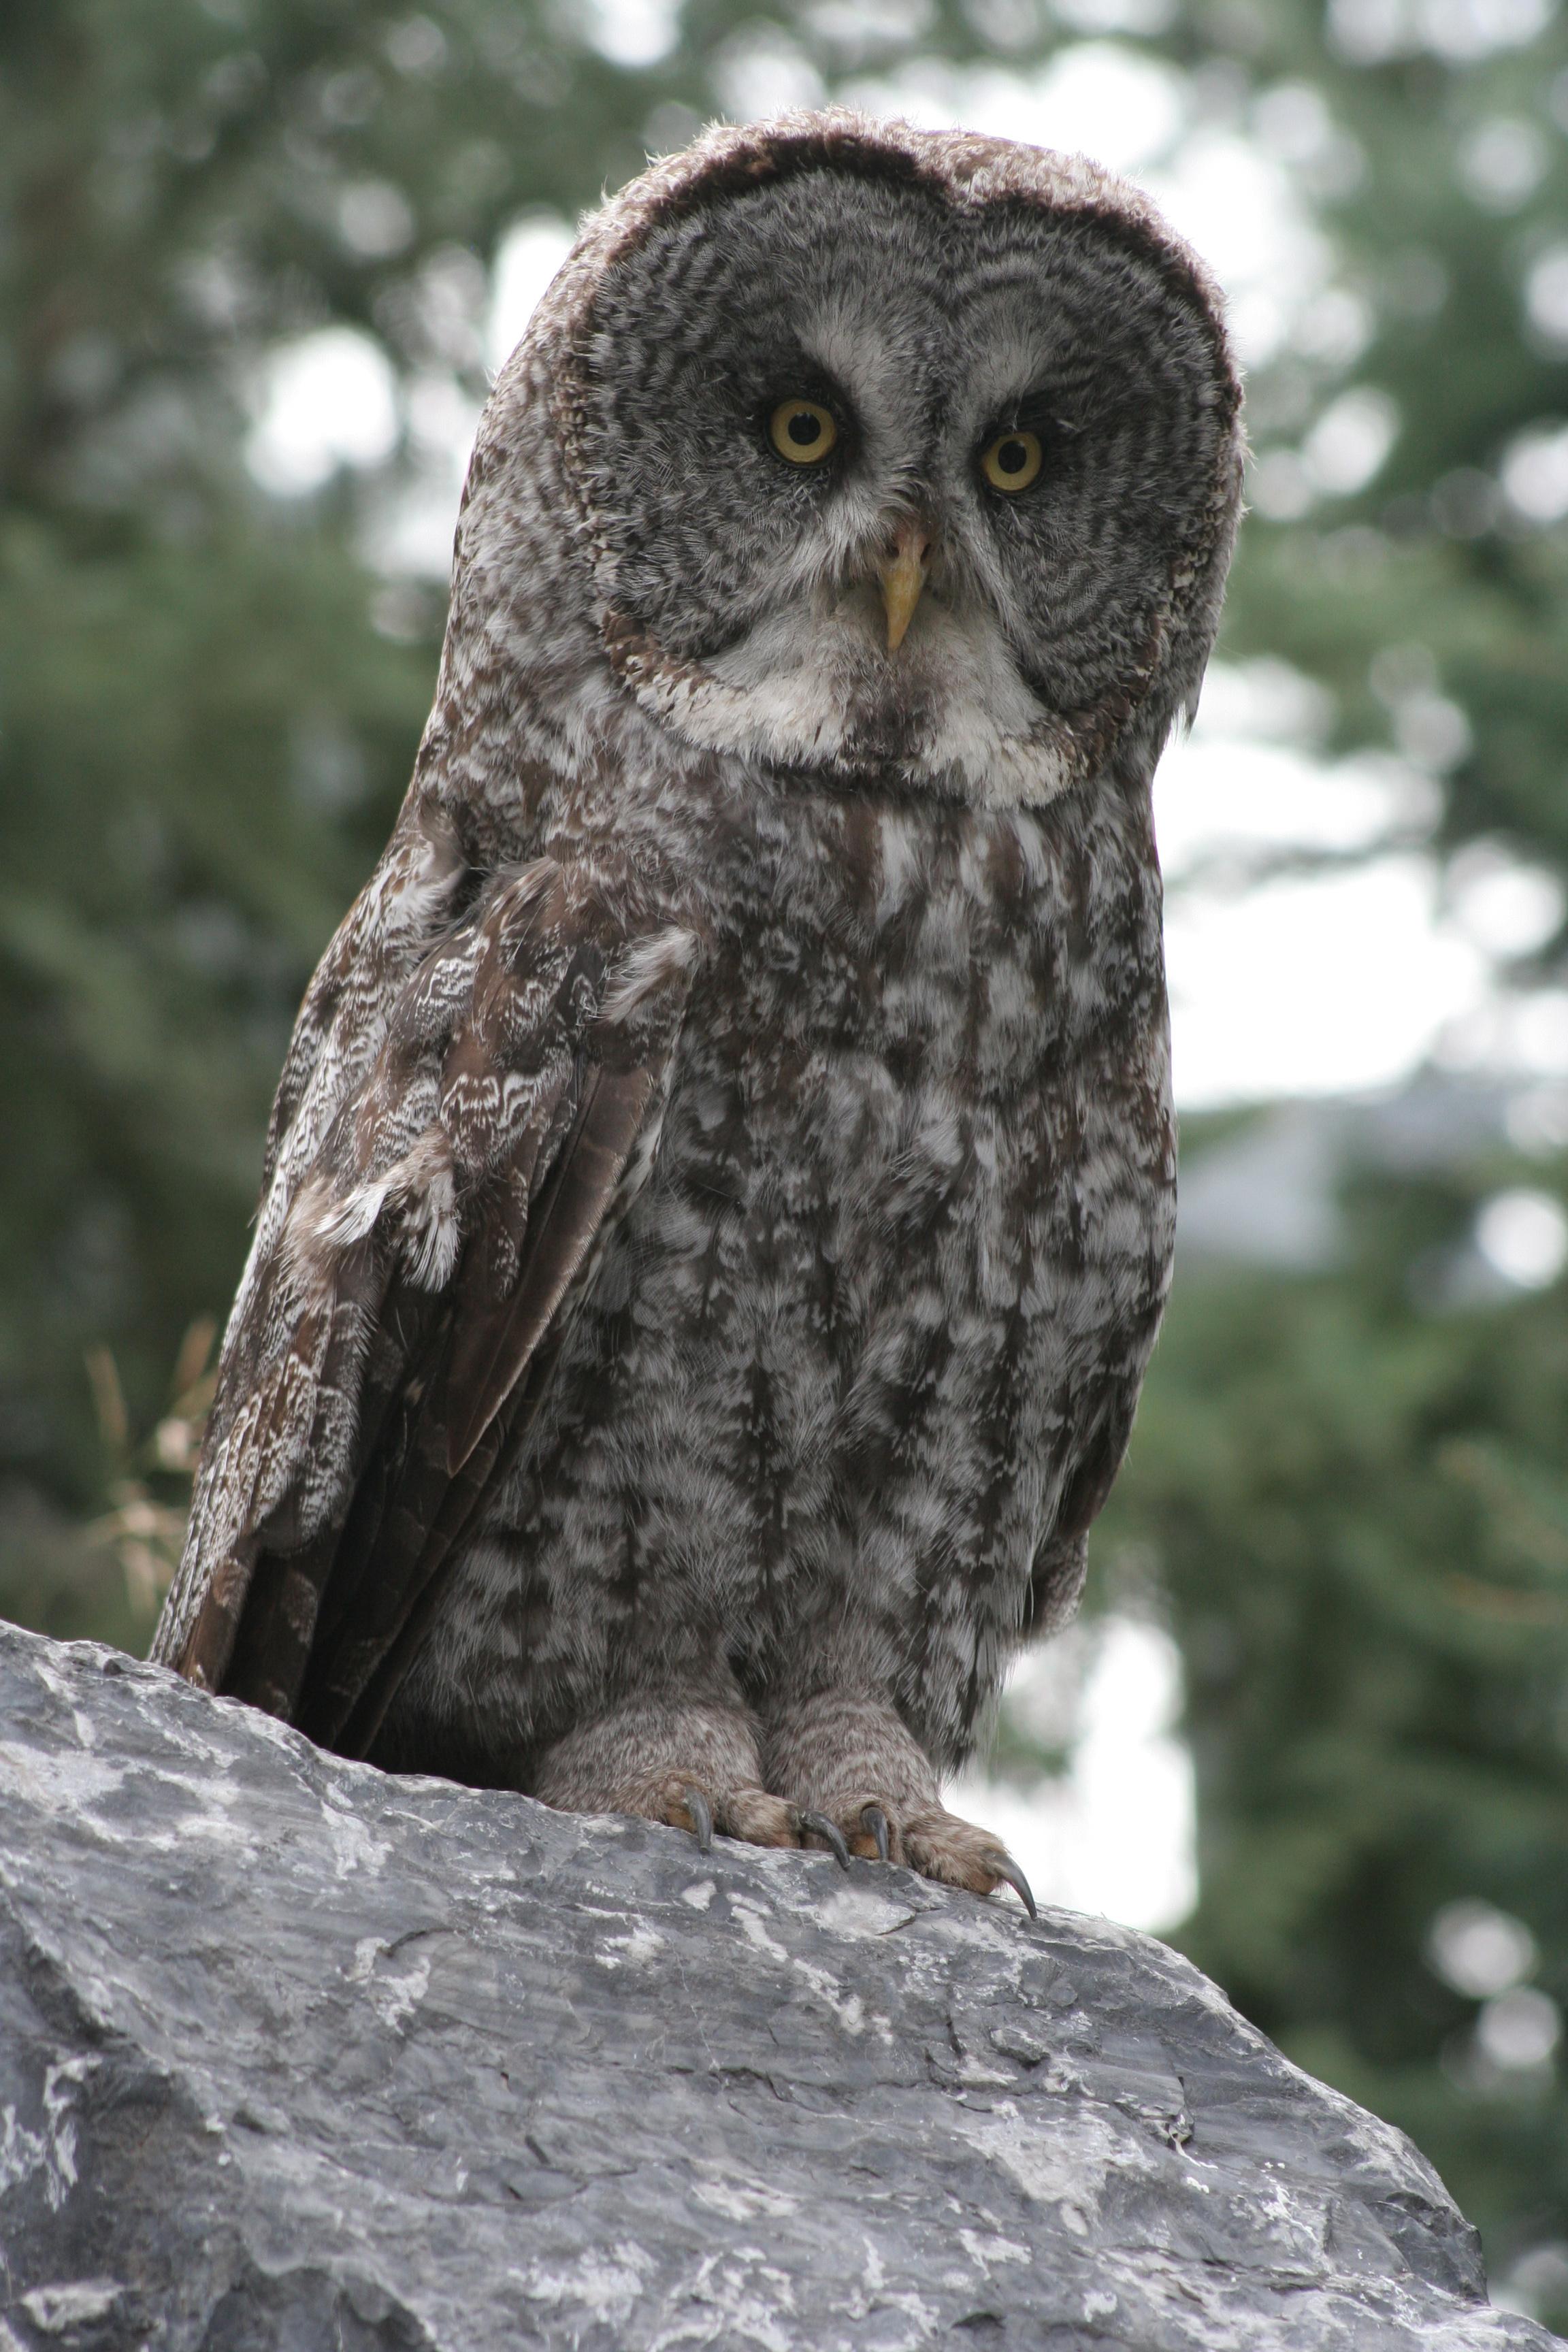 File:Great Grey Owl.jpg - Wikimedia Commons